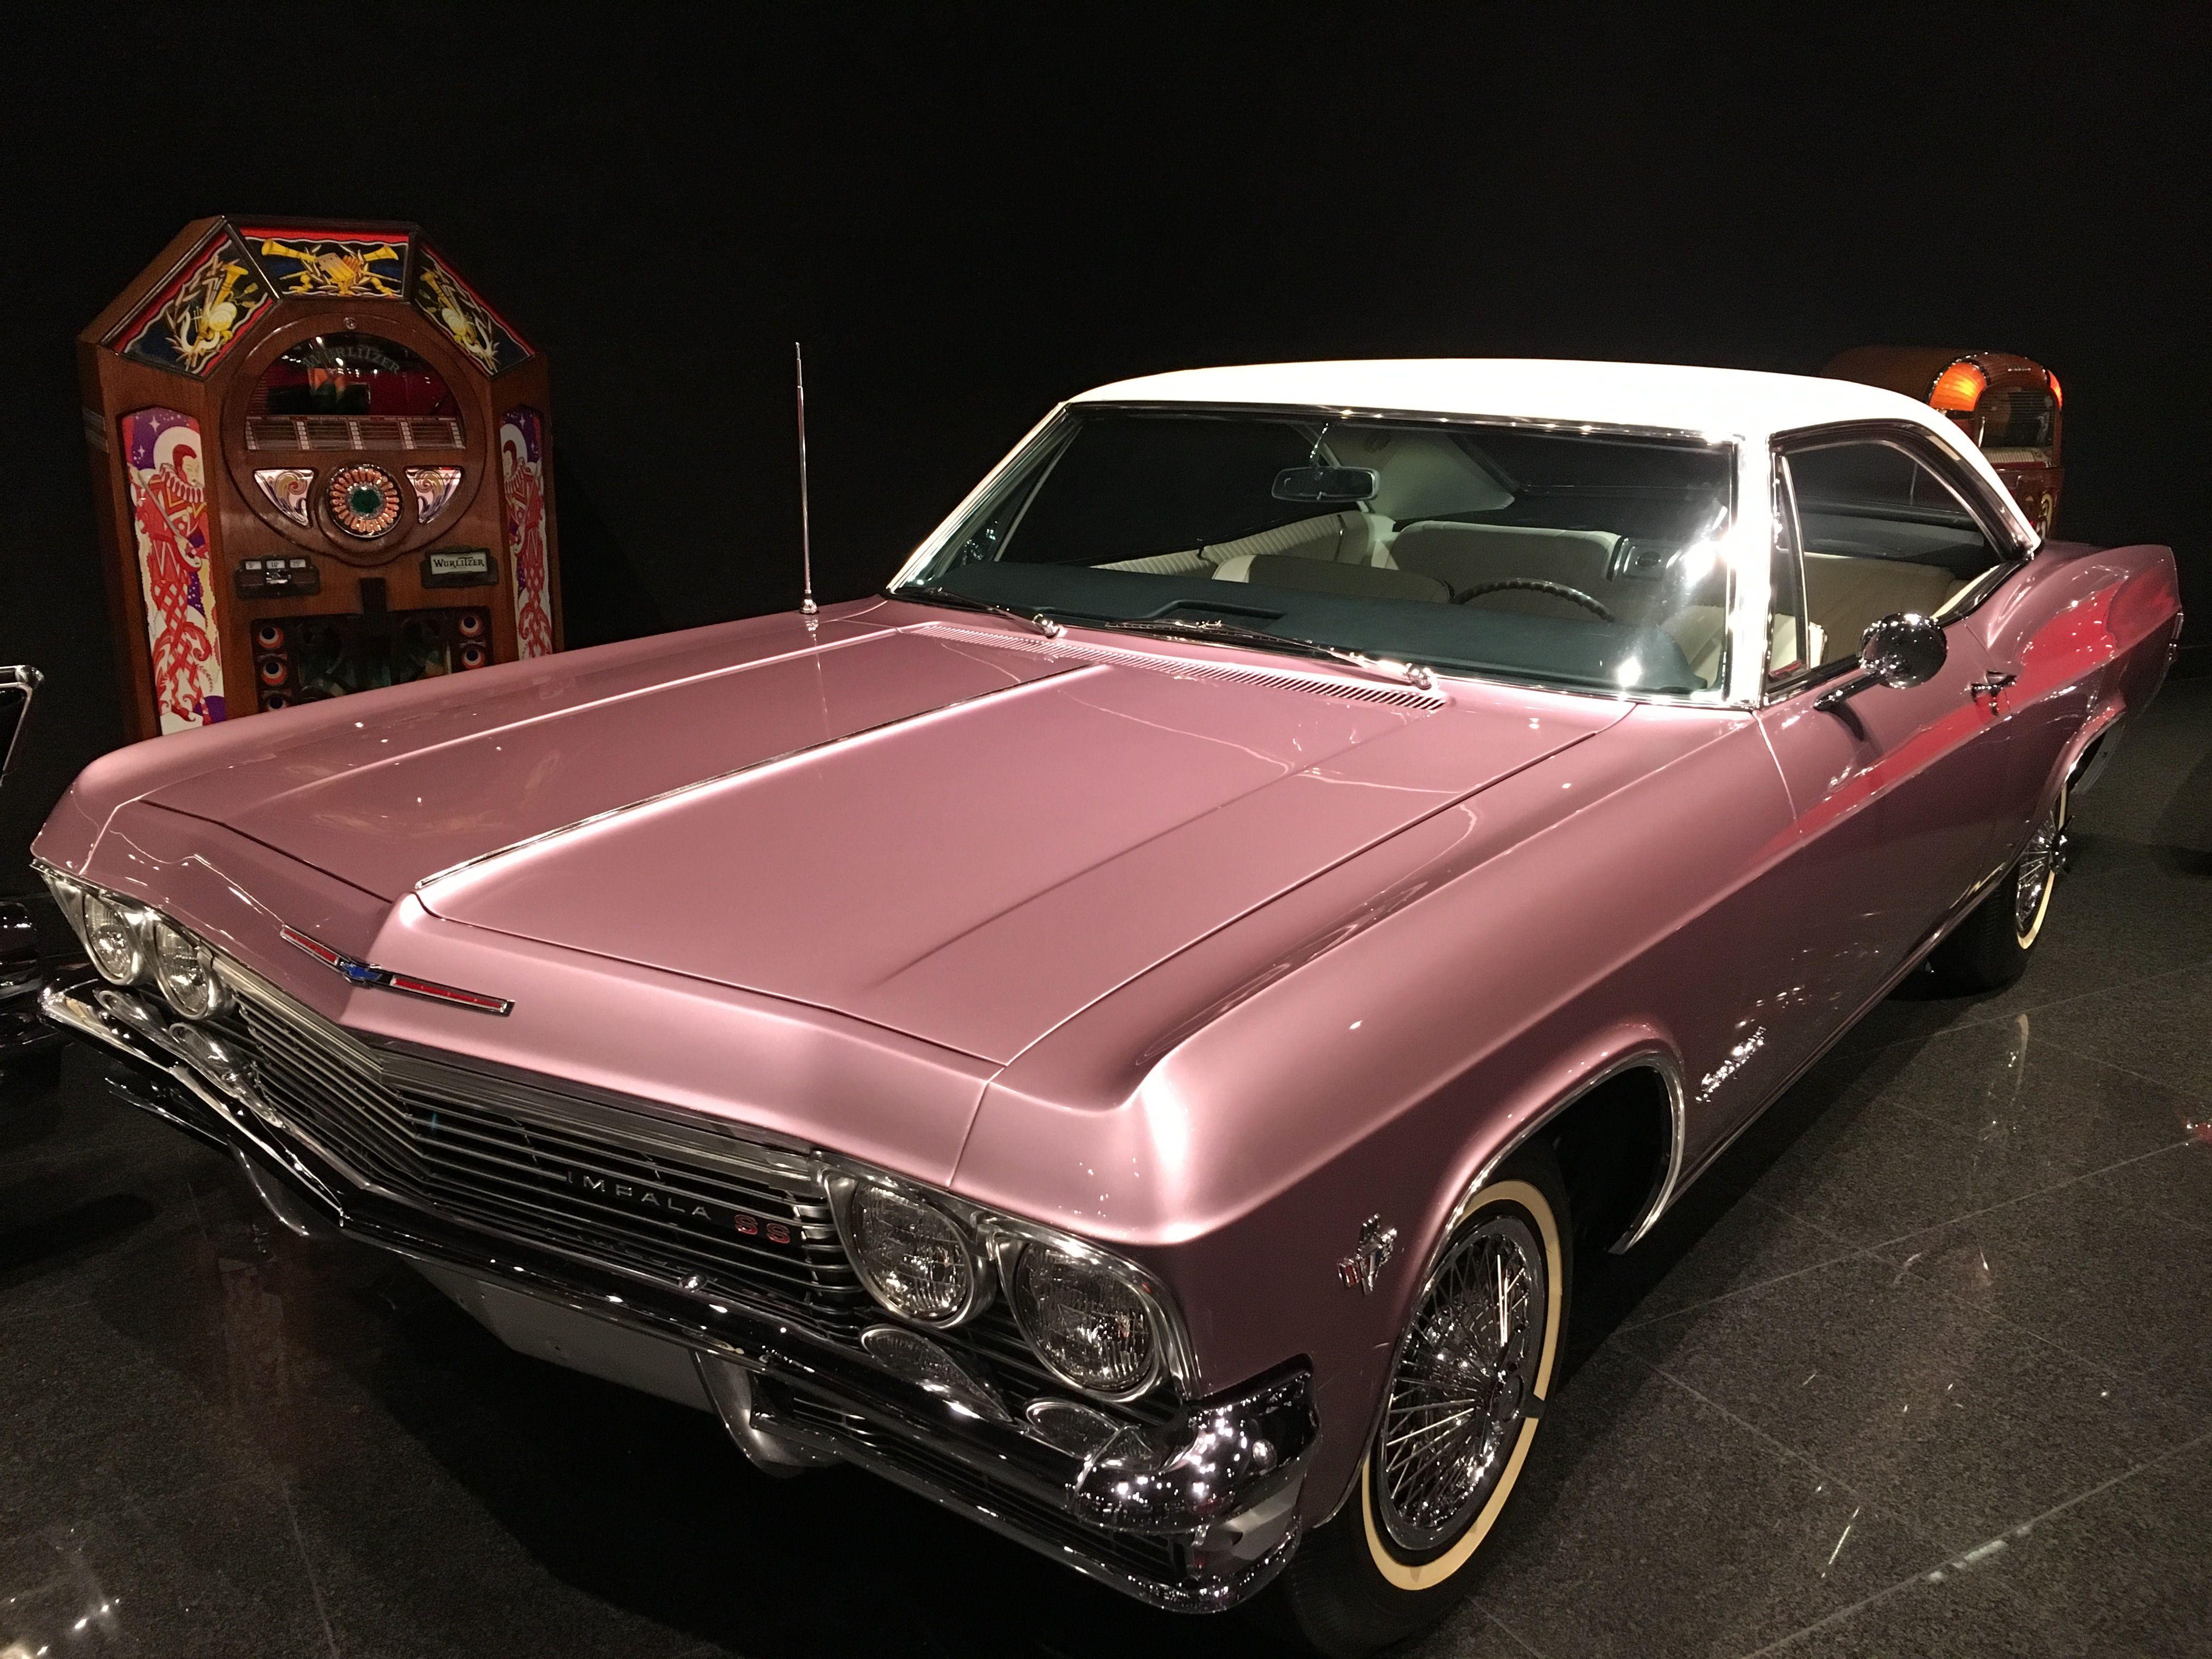 Car Heaven – The Blackhawk Automotive Museum in Danville, California